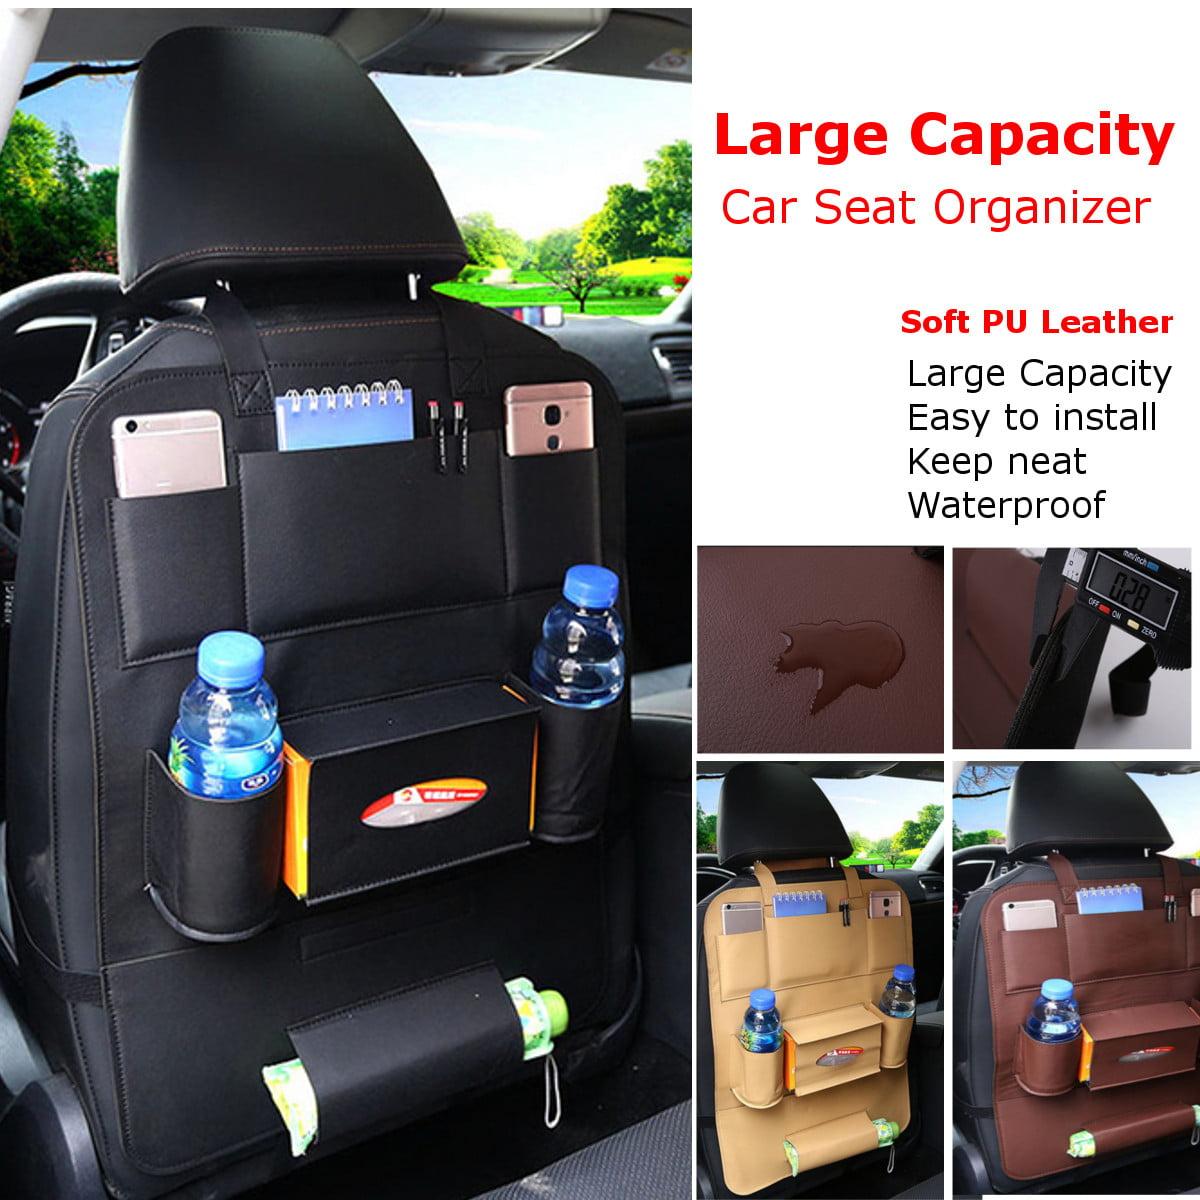 Auto Car Vehicle Seat Back Organizer Muiti-pocket Waterproof Soft Leather Storage Bag Box Case (Color: Beige/Brown/Black)